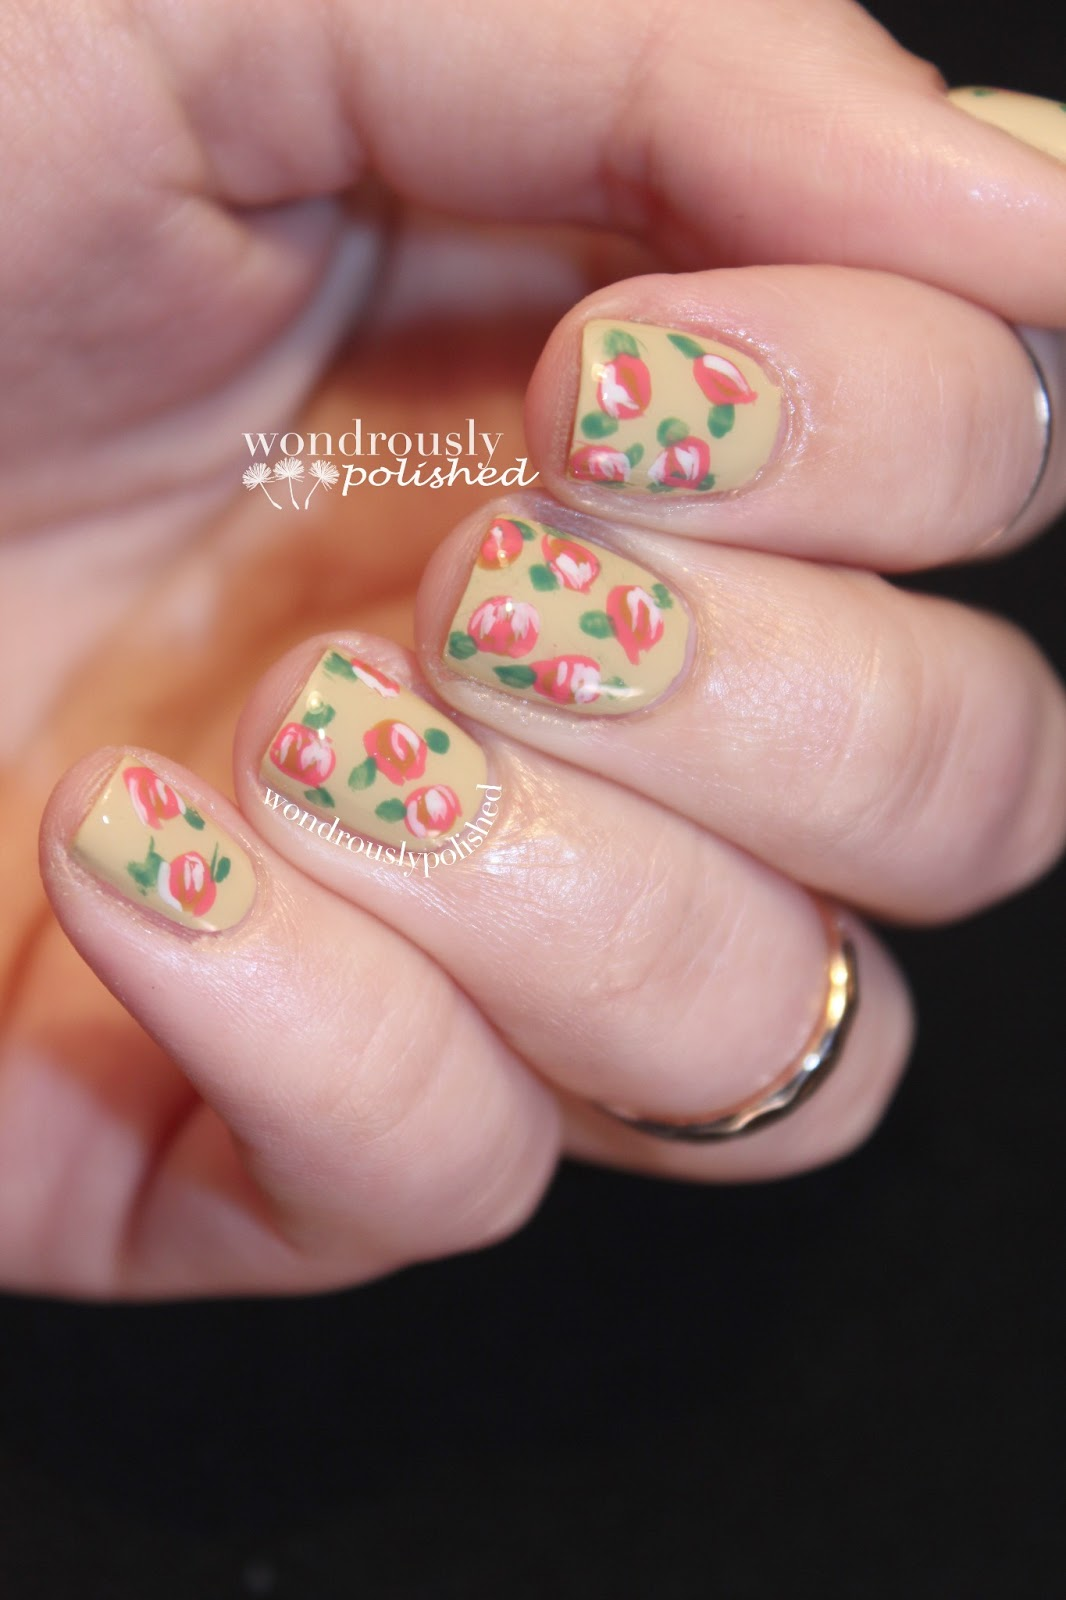 Wondrously Polished April Nail Art Challenge: Wondrously Polished: March Nail Art Challenge